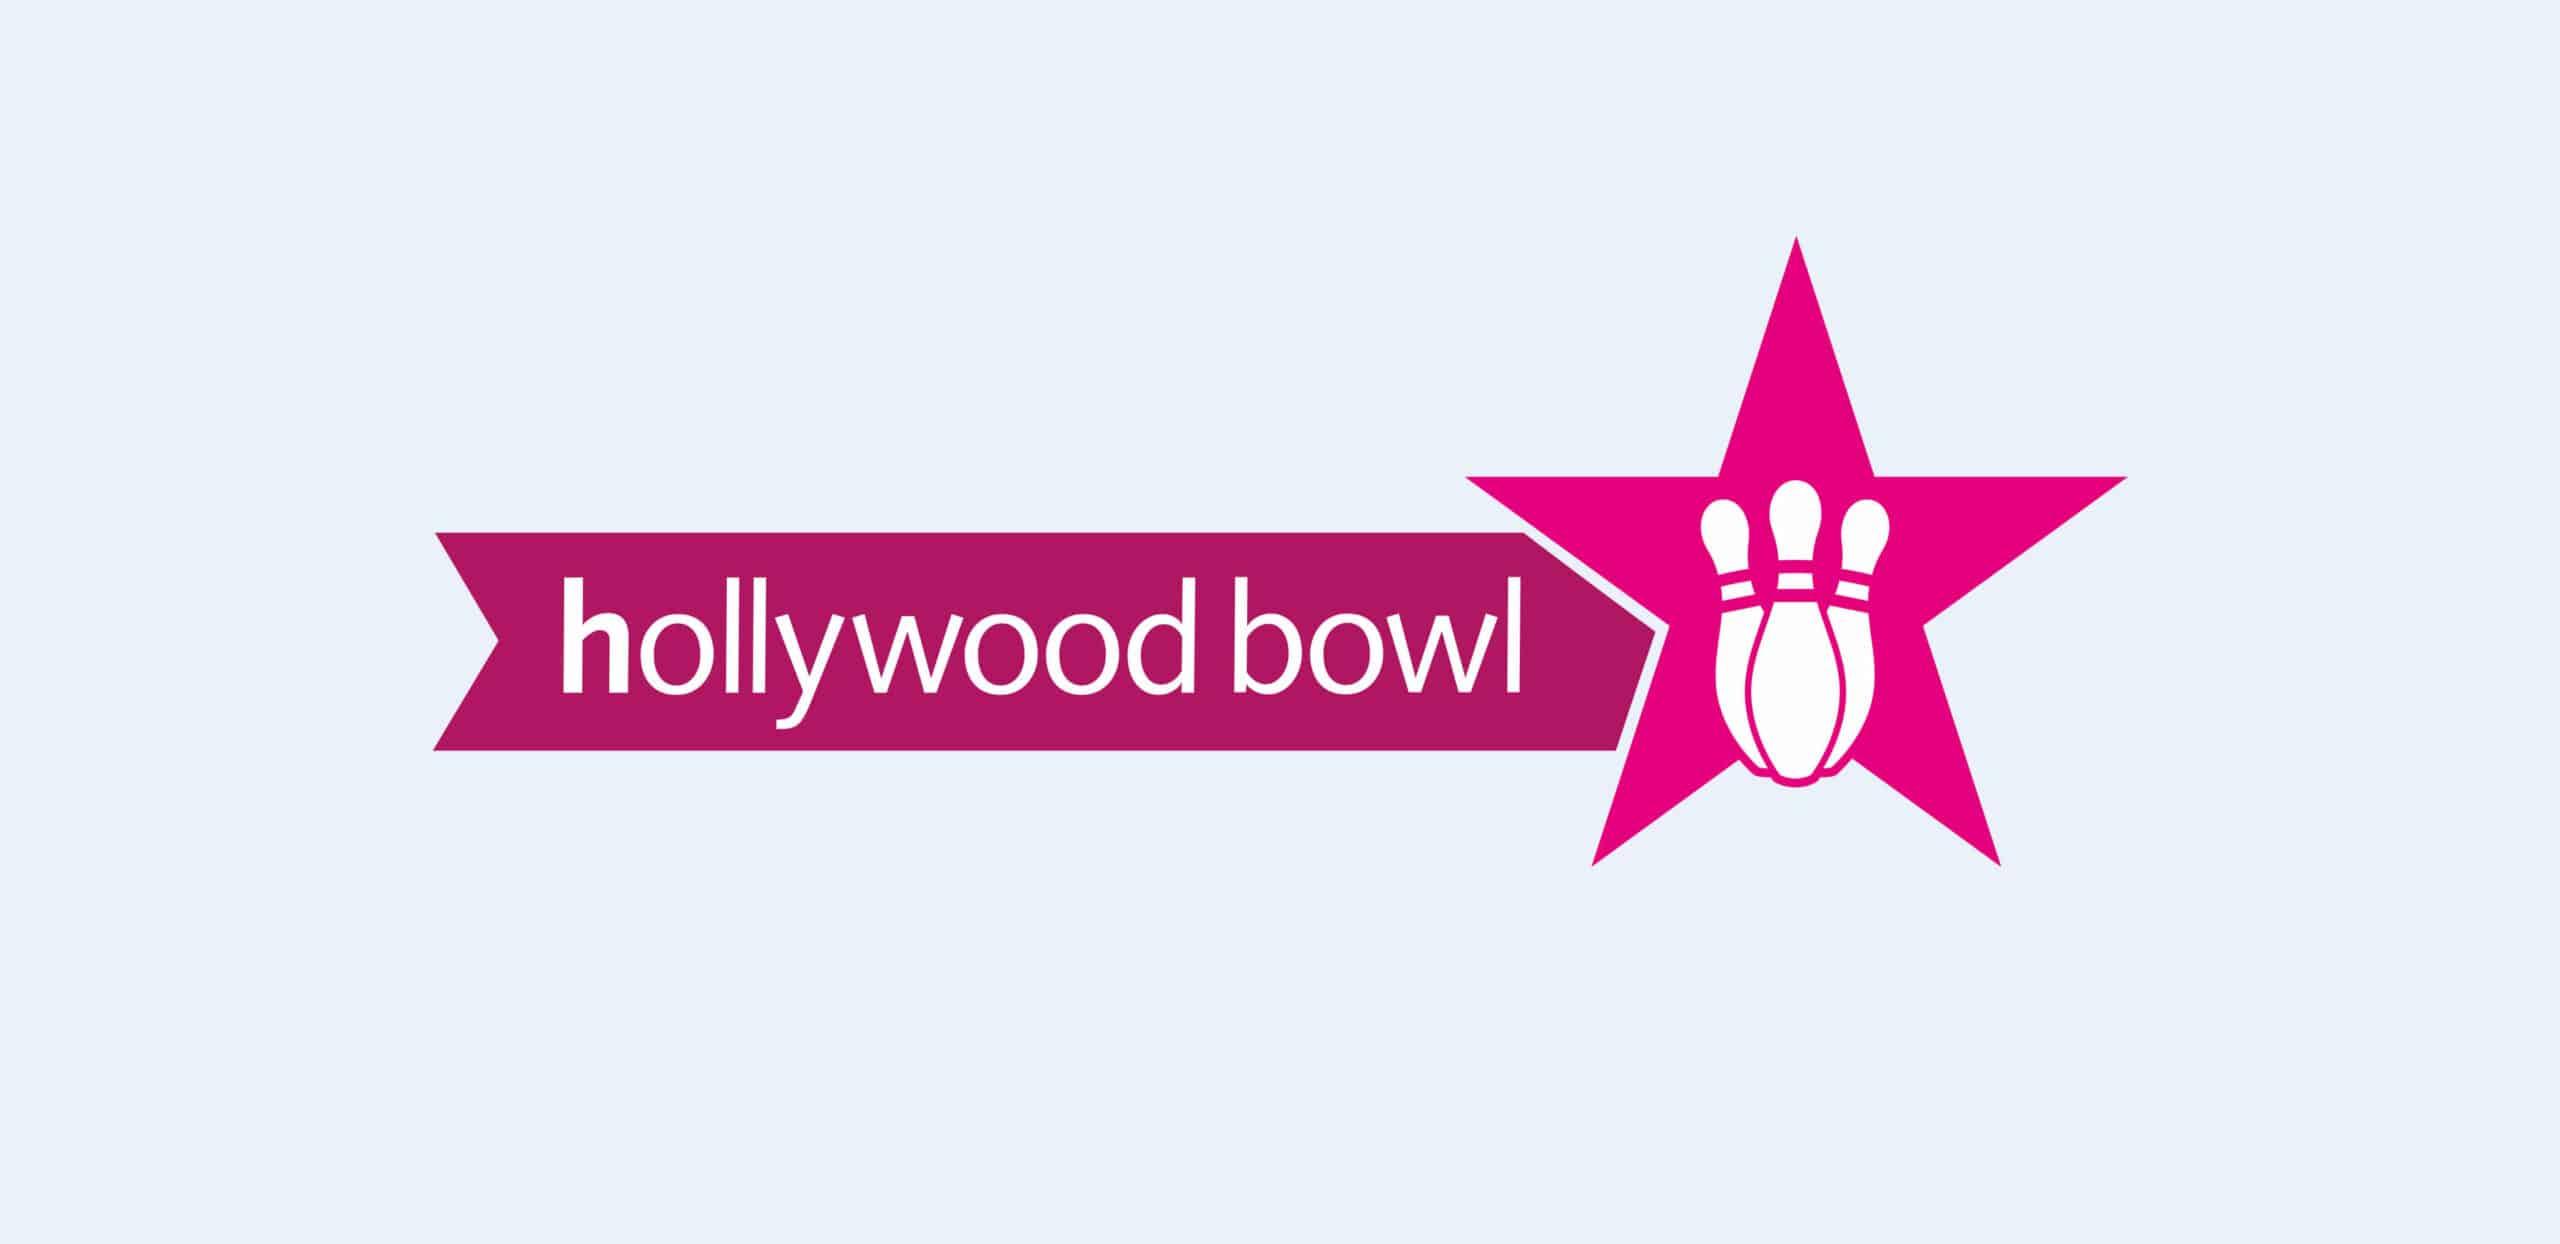 Hollywood Bowl New Brand